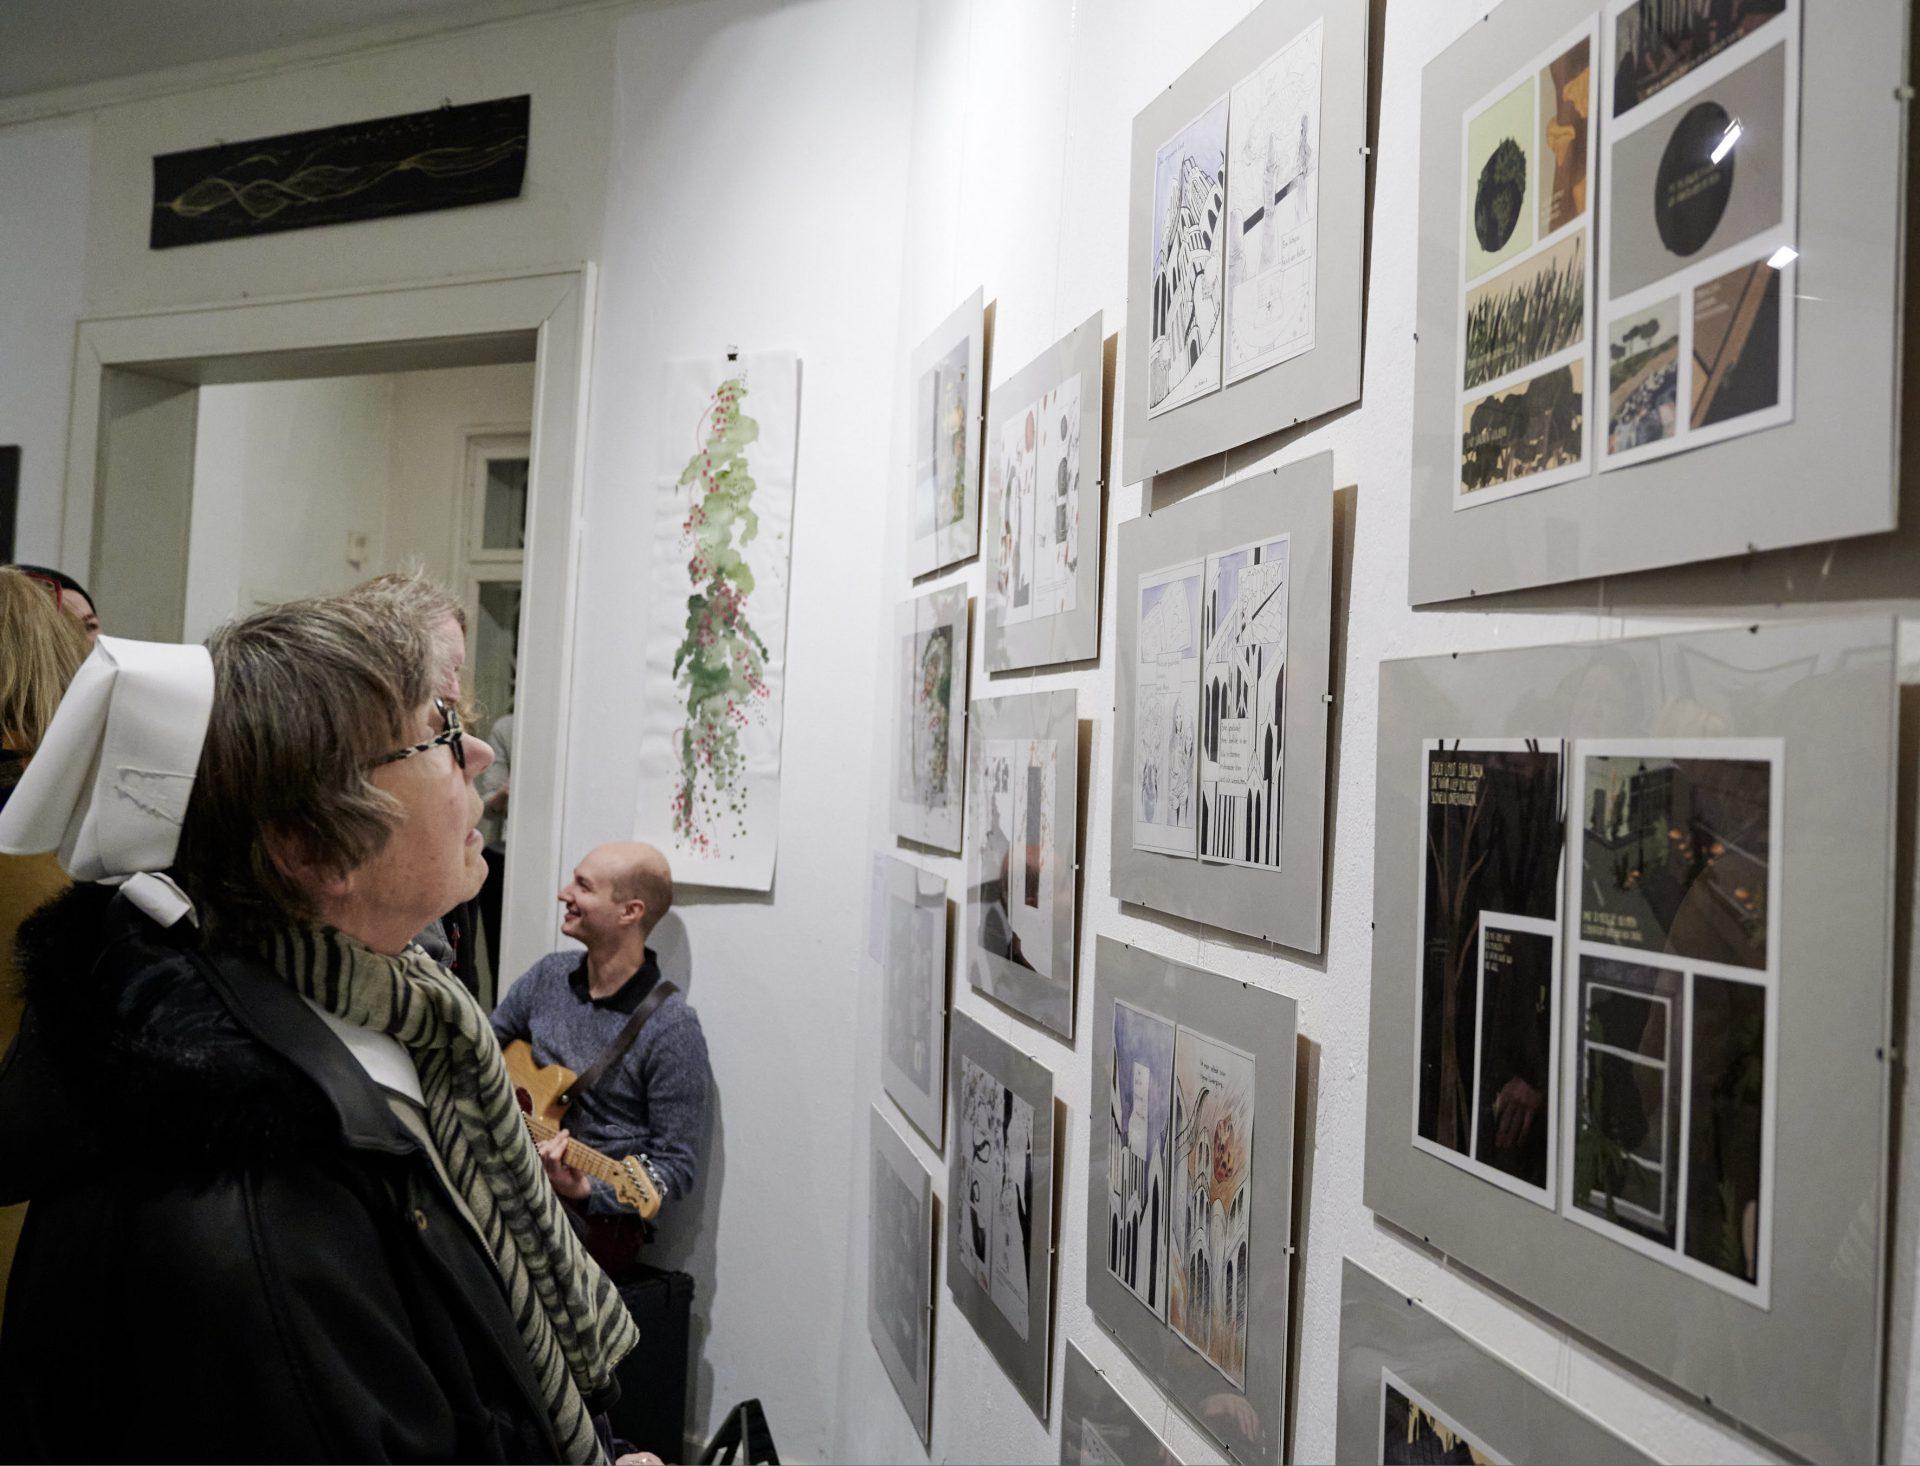 Ausstellungseröffnung im Roten Pavillon, Bad Doberan